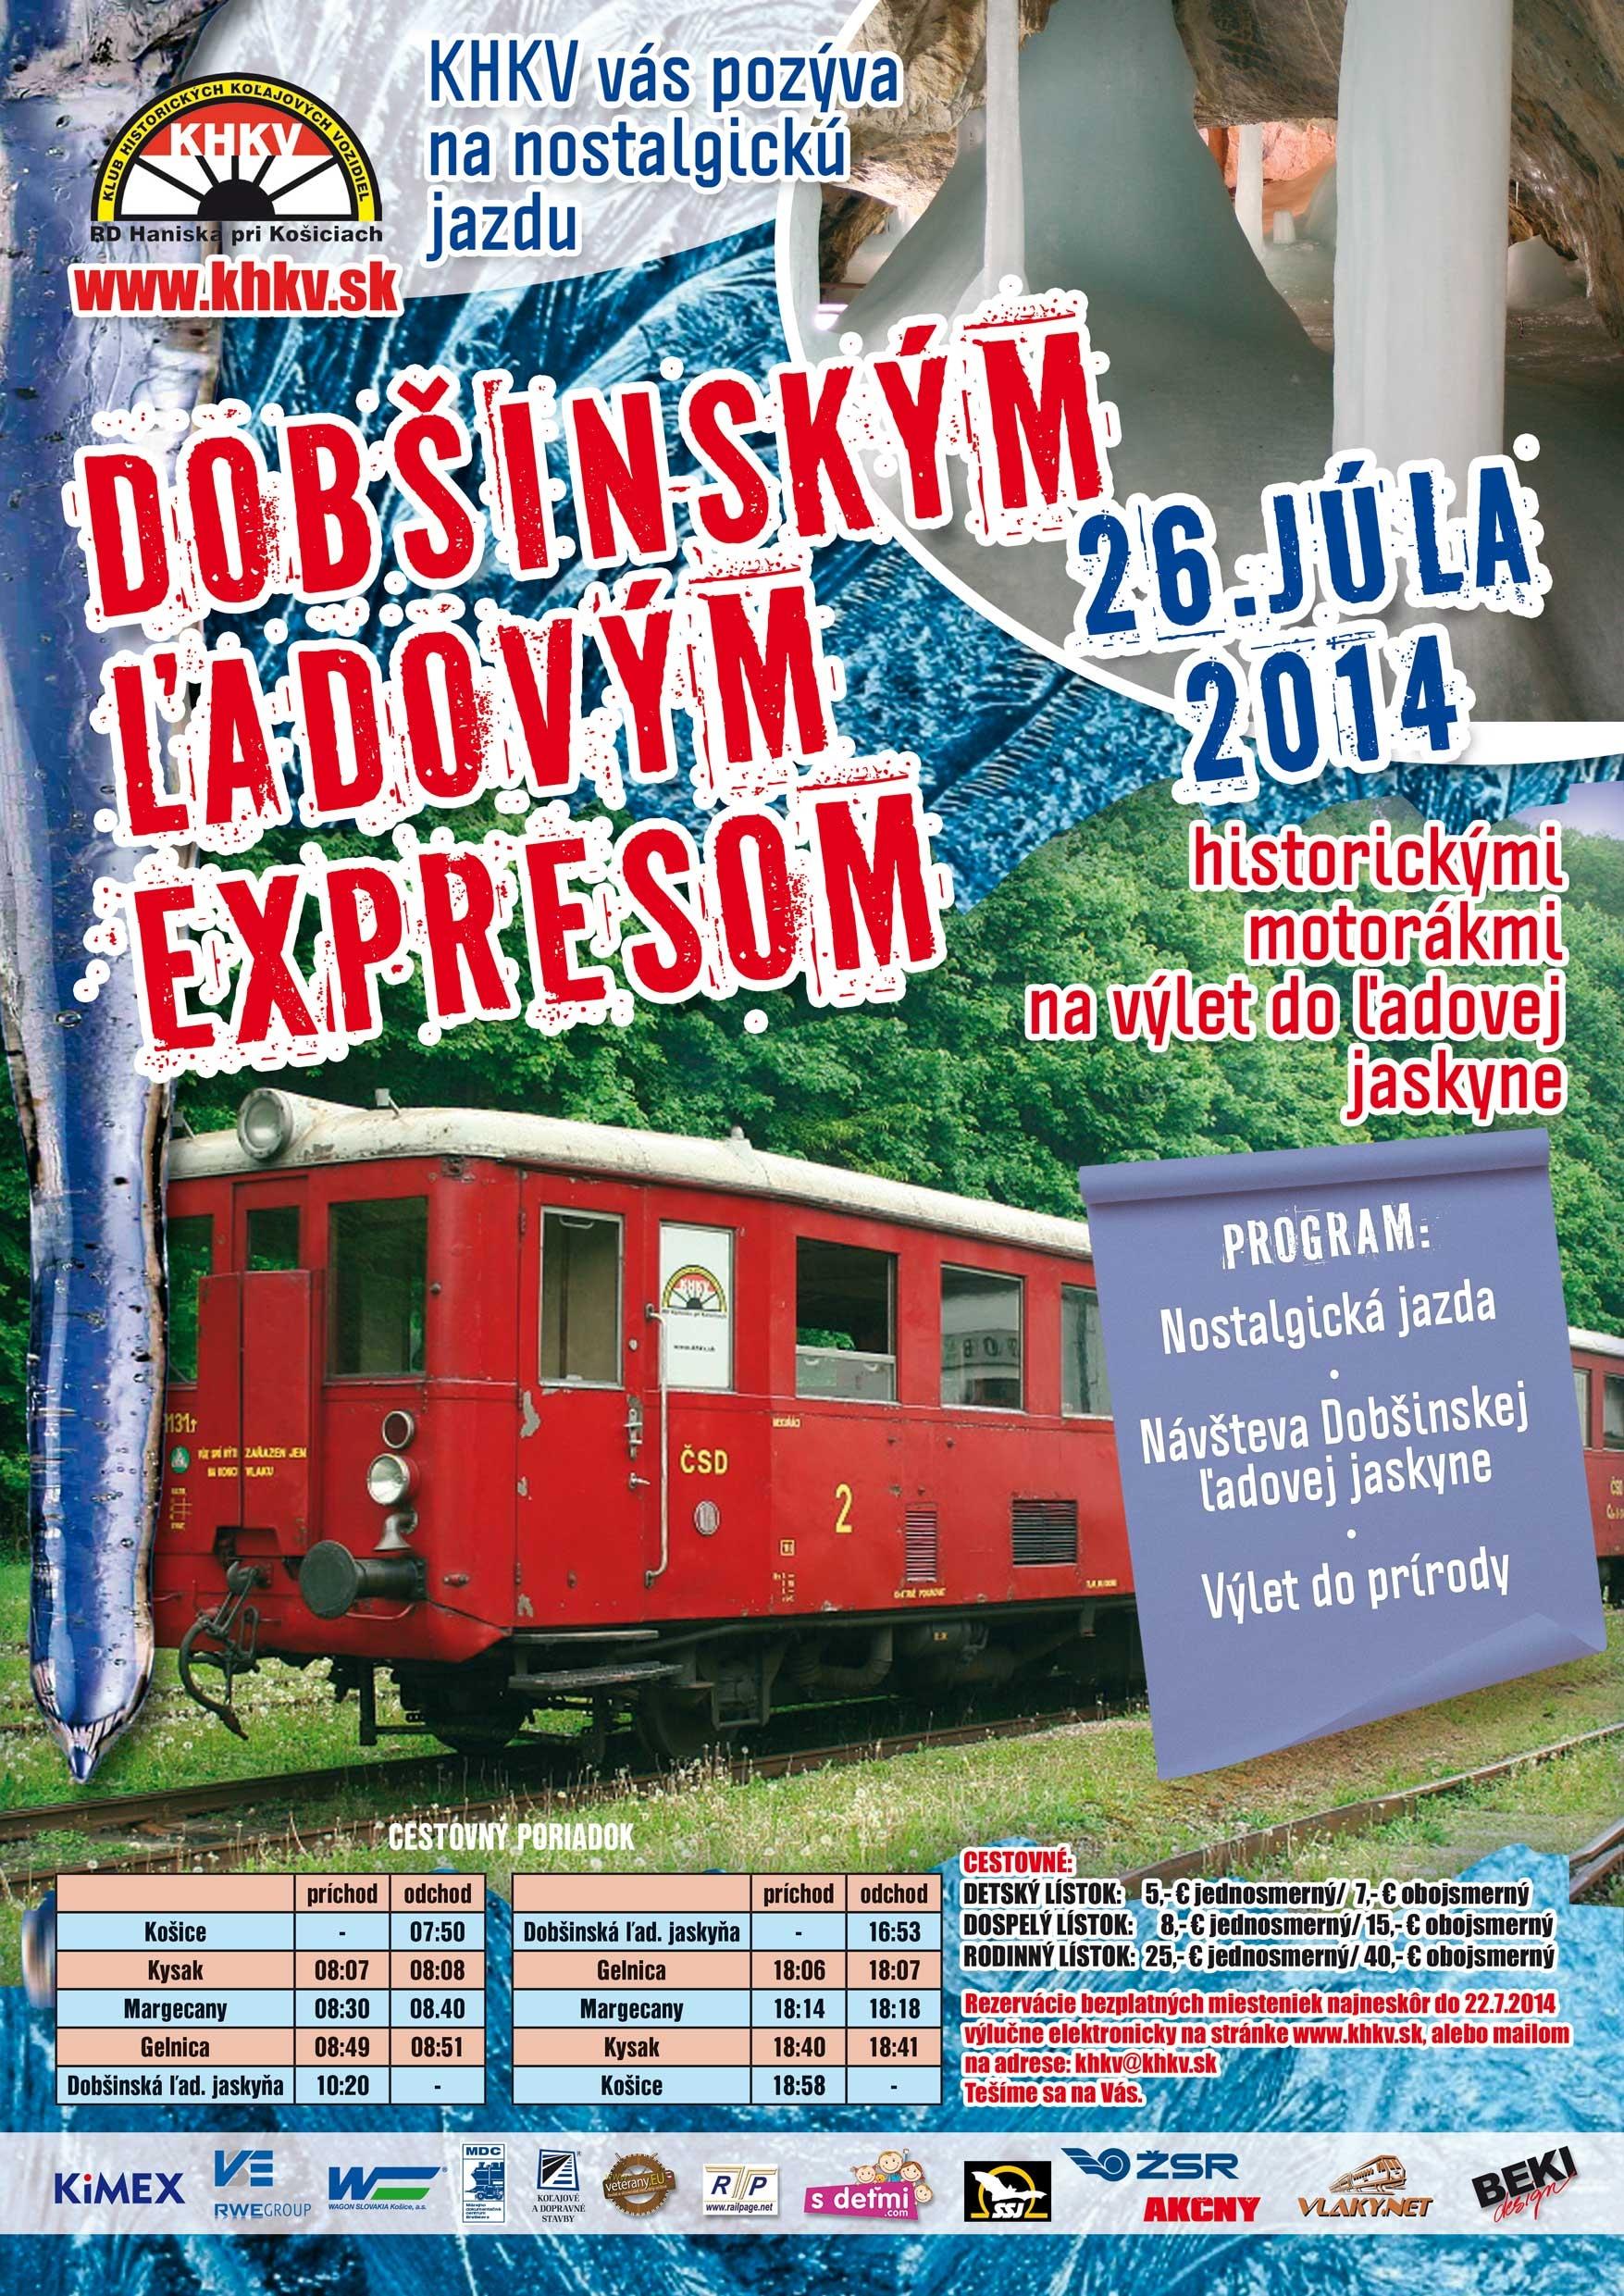 Dobsinsky ladovy expres 2014